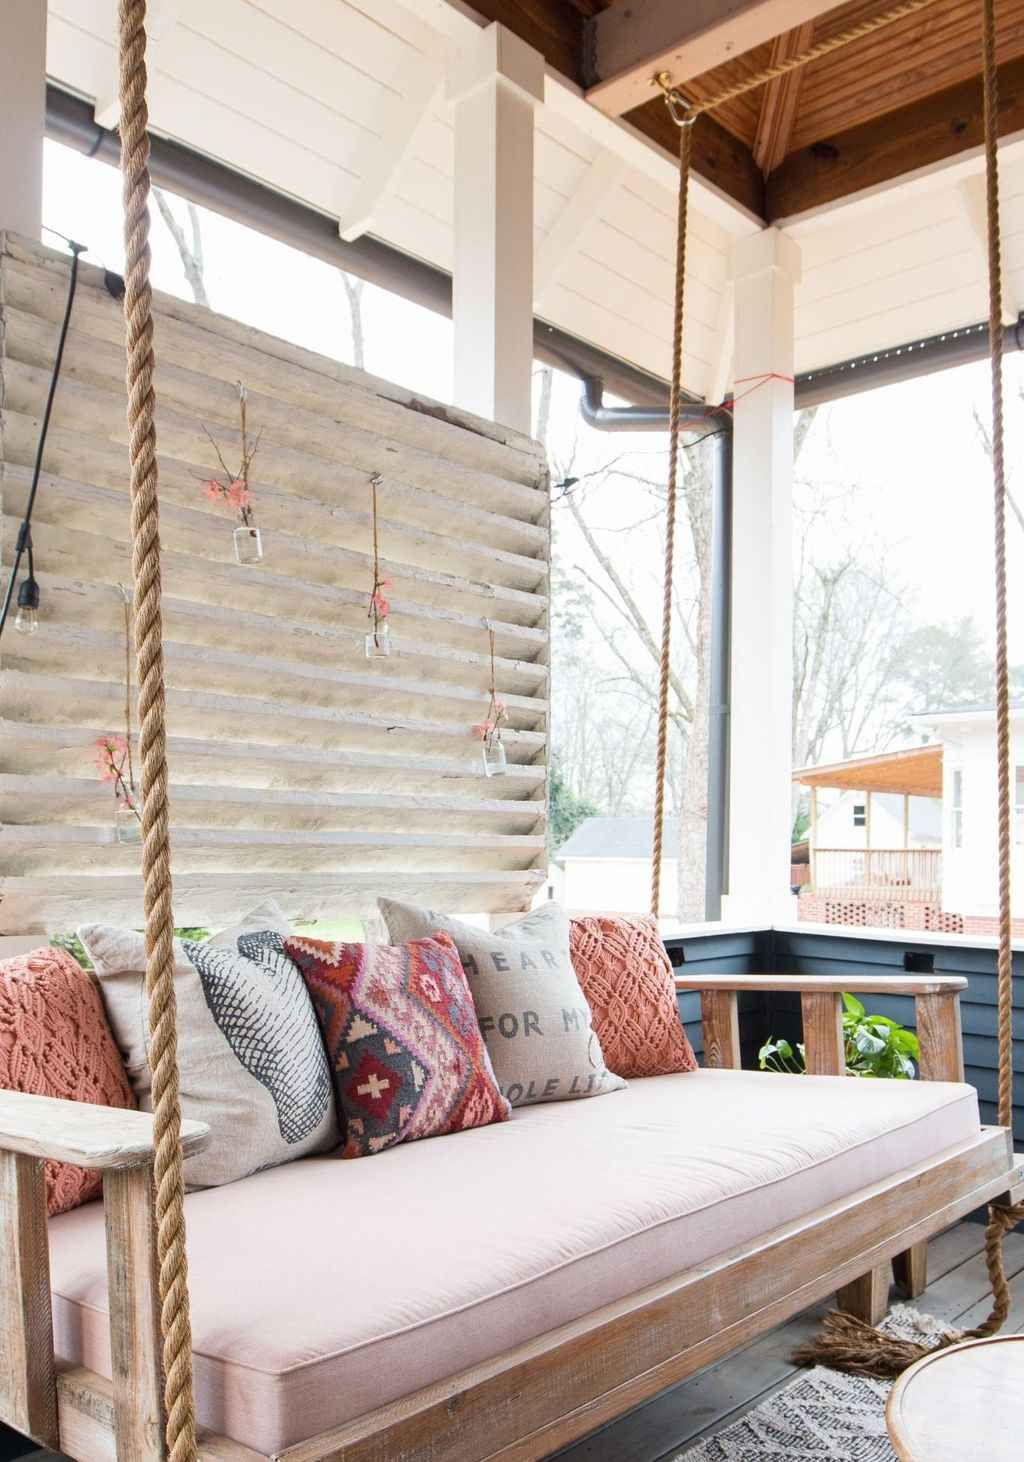 Cool 70 relaxing farmhouse porch swing design ideas https